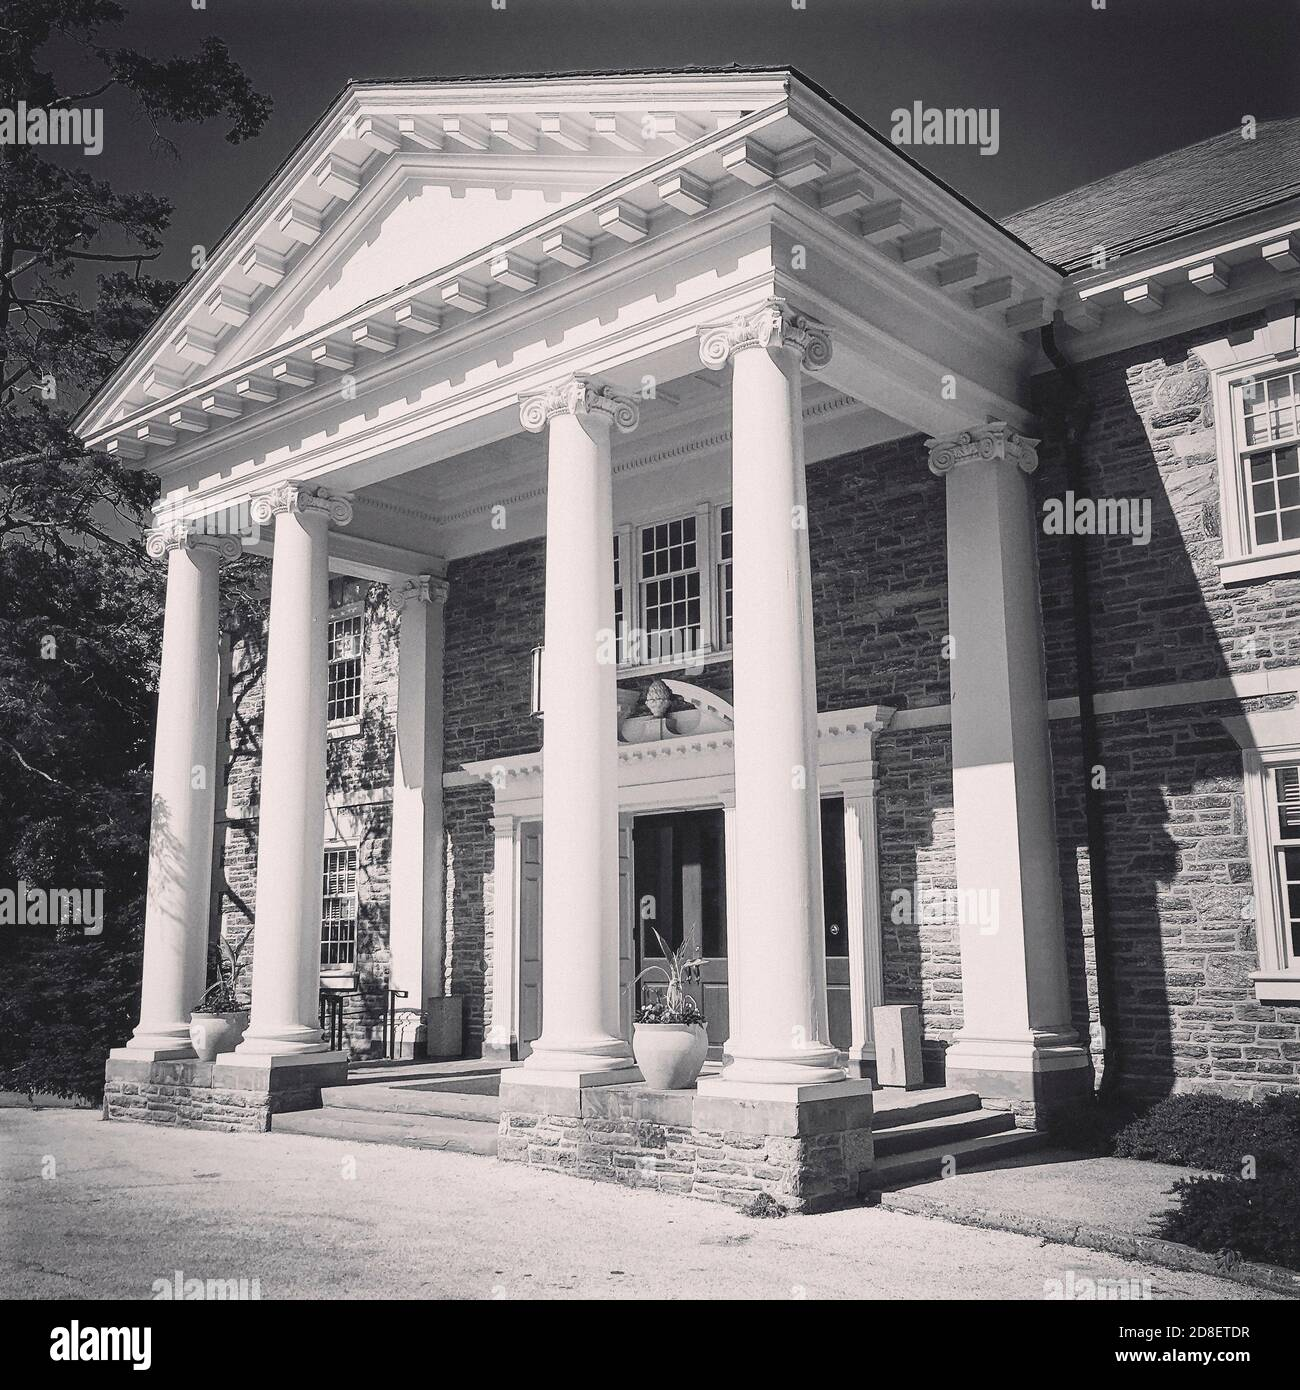 Roberts Hall, Haverford College, Haverford, Pennsylvanie, États-Unis Banque D'Images